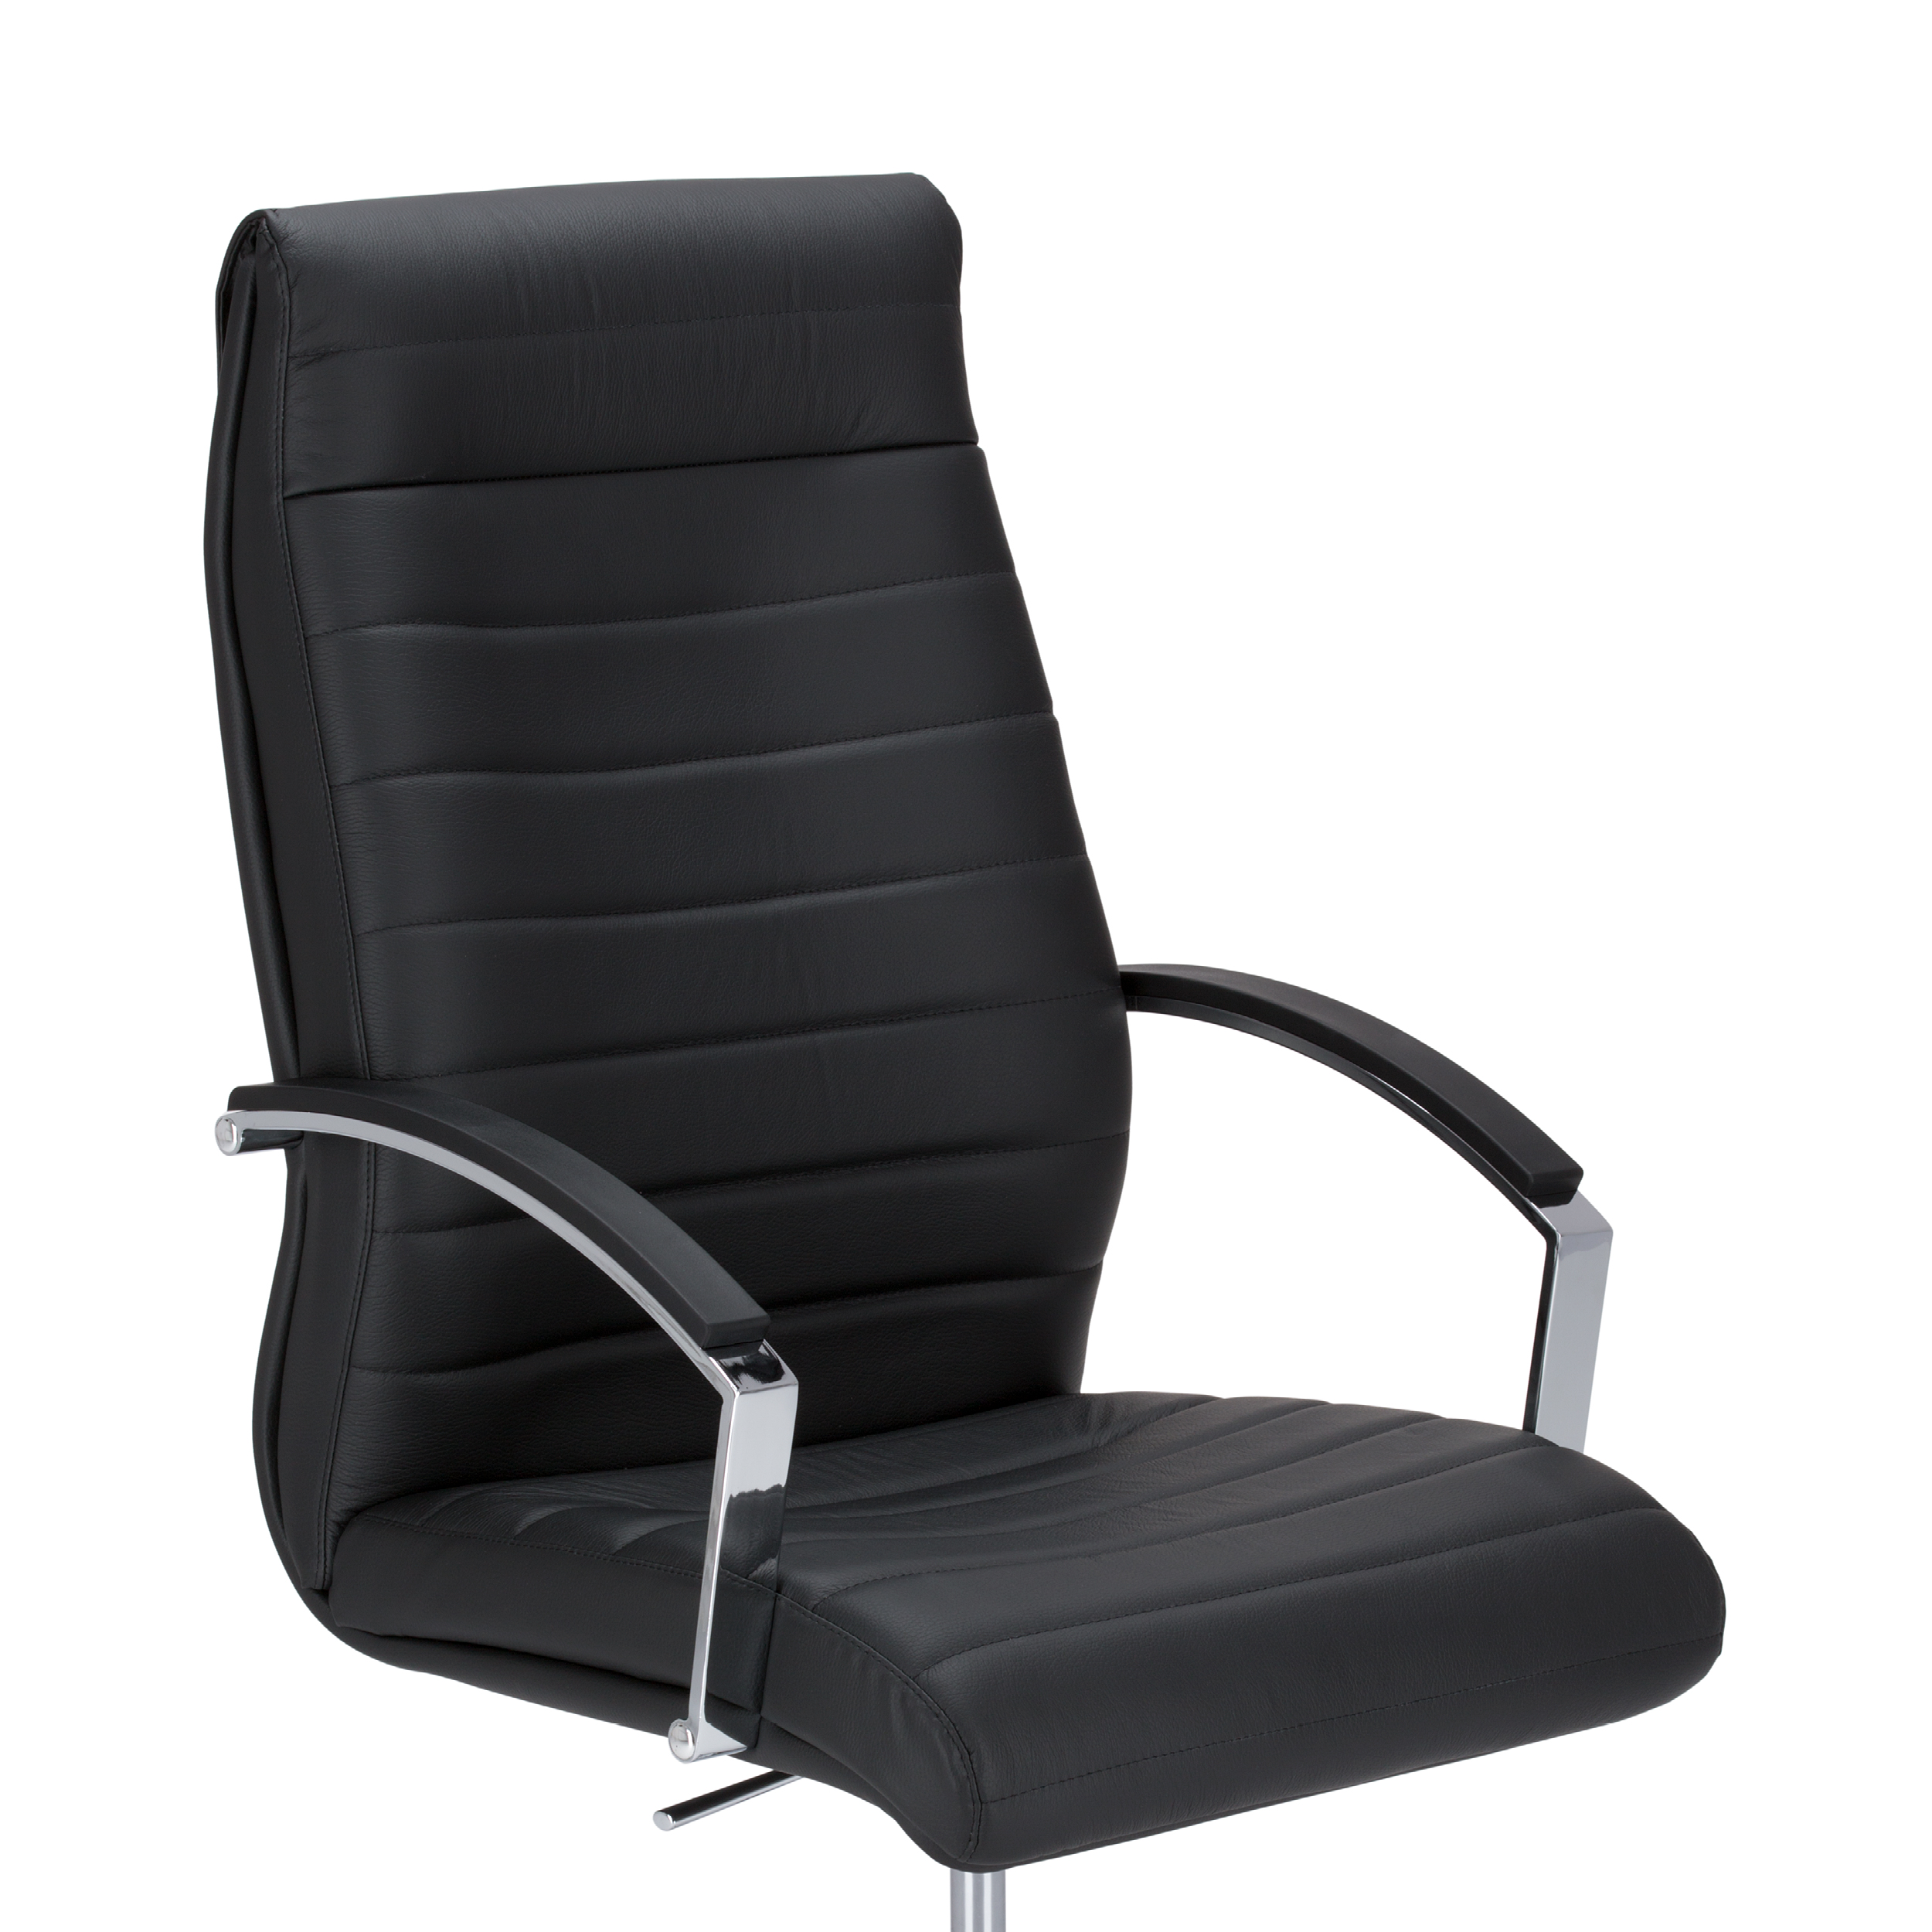 office-chairs_1-1_Lynx-9.jpg